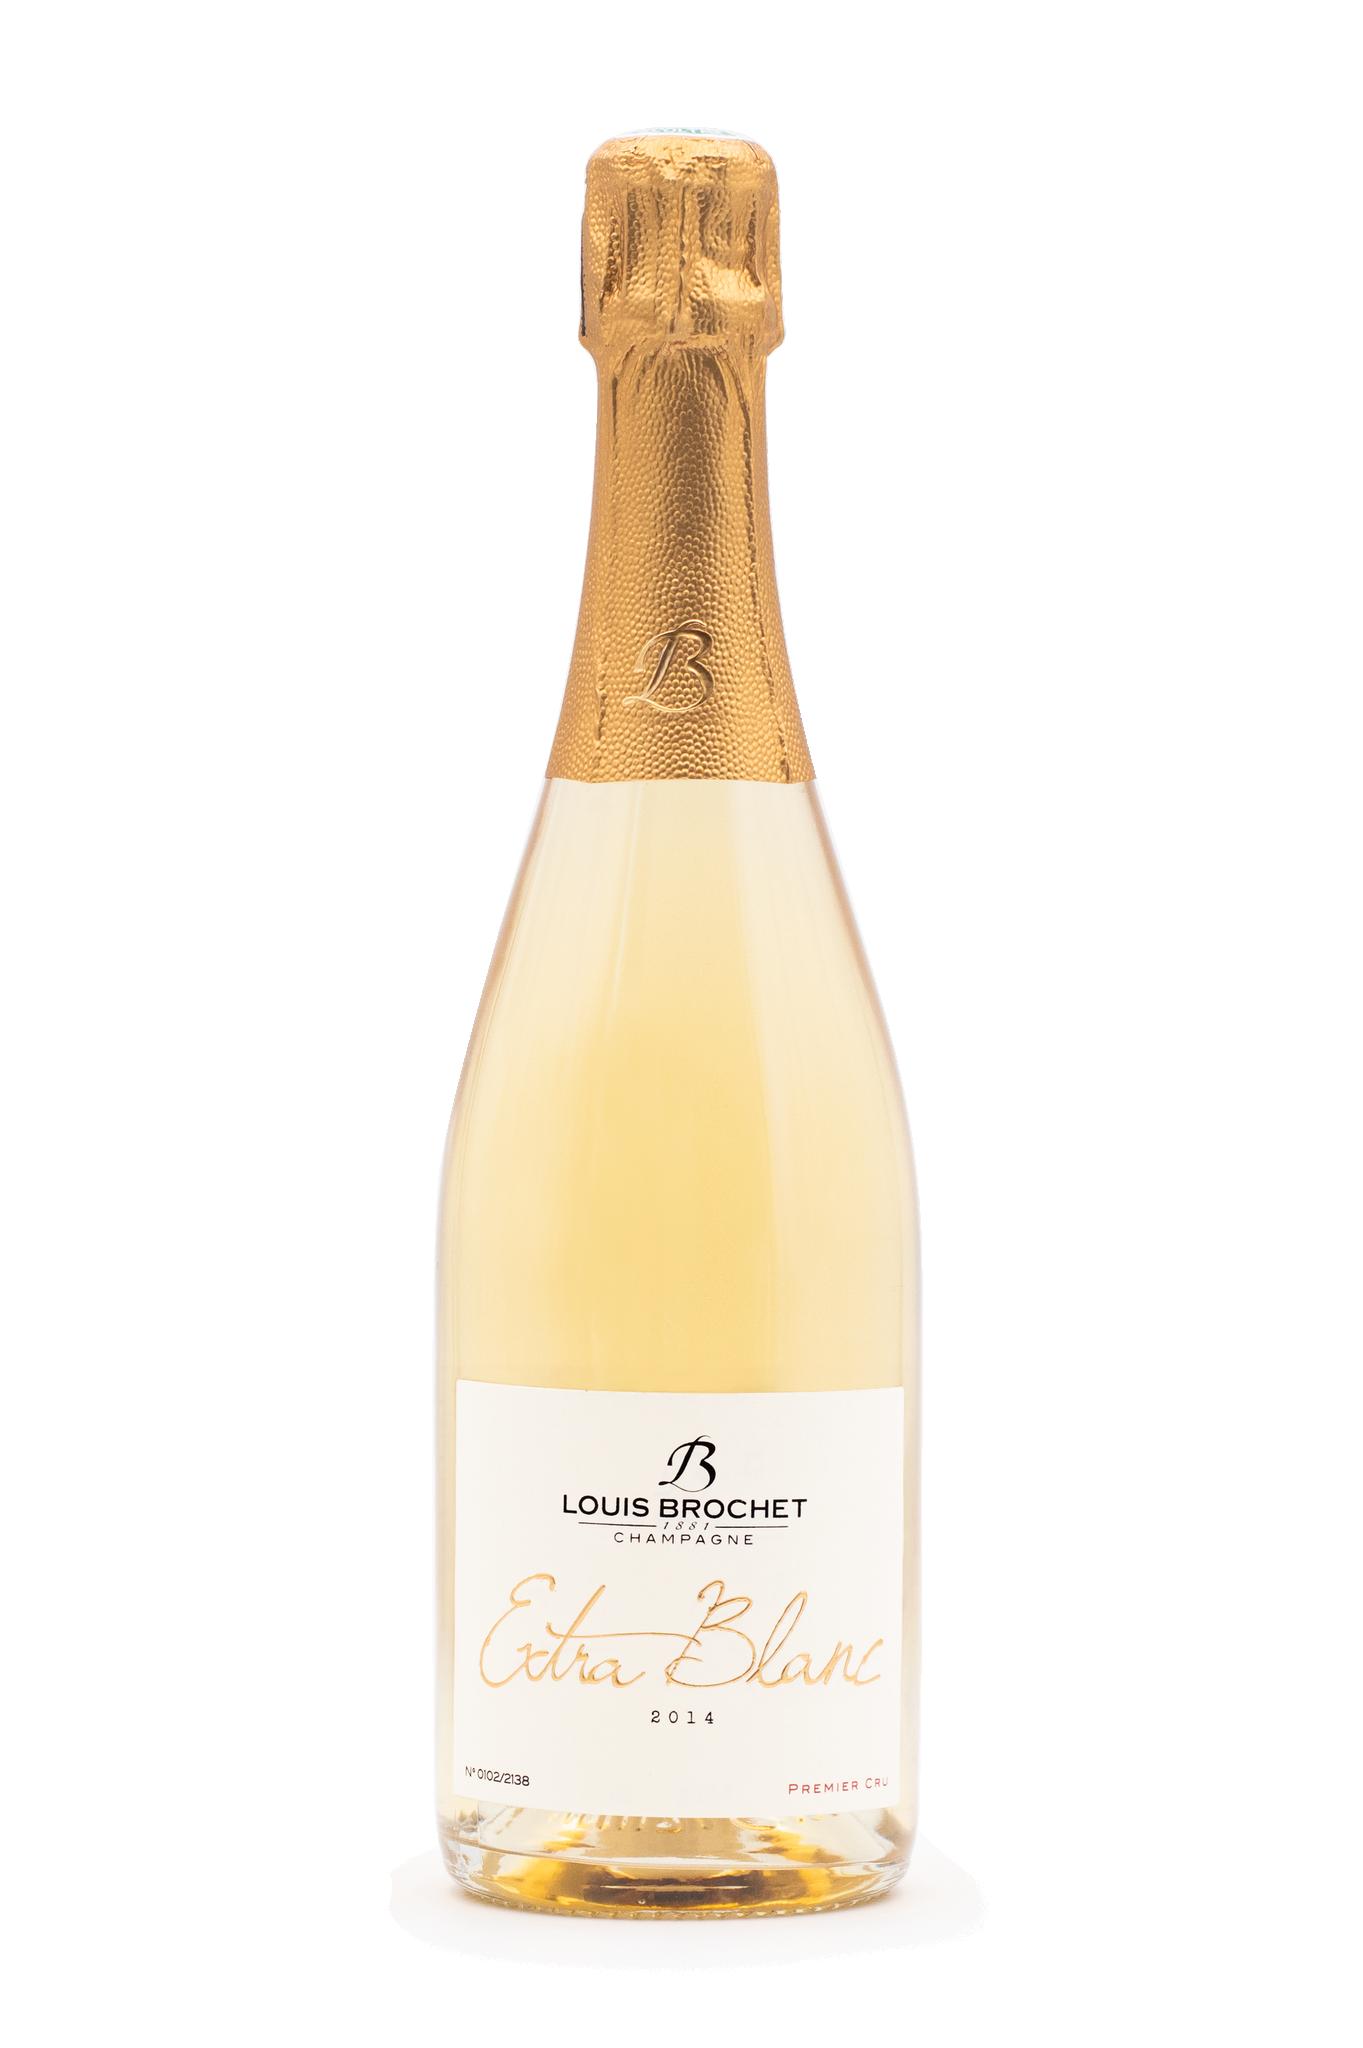 Champagne Extra Blanc 2014 1er Cru Louis Brochet